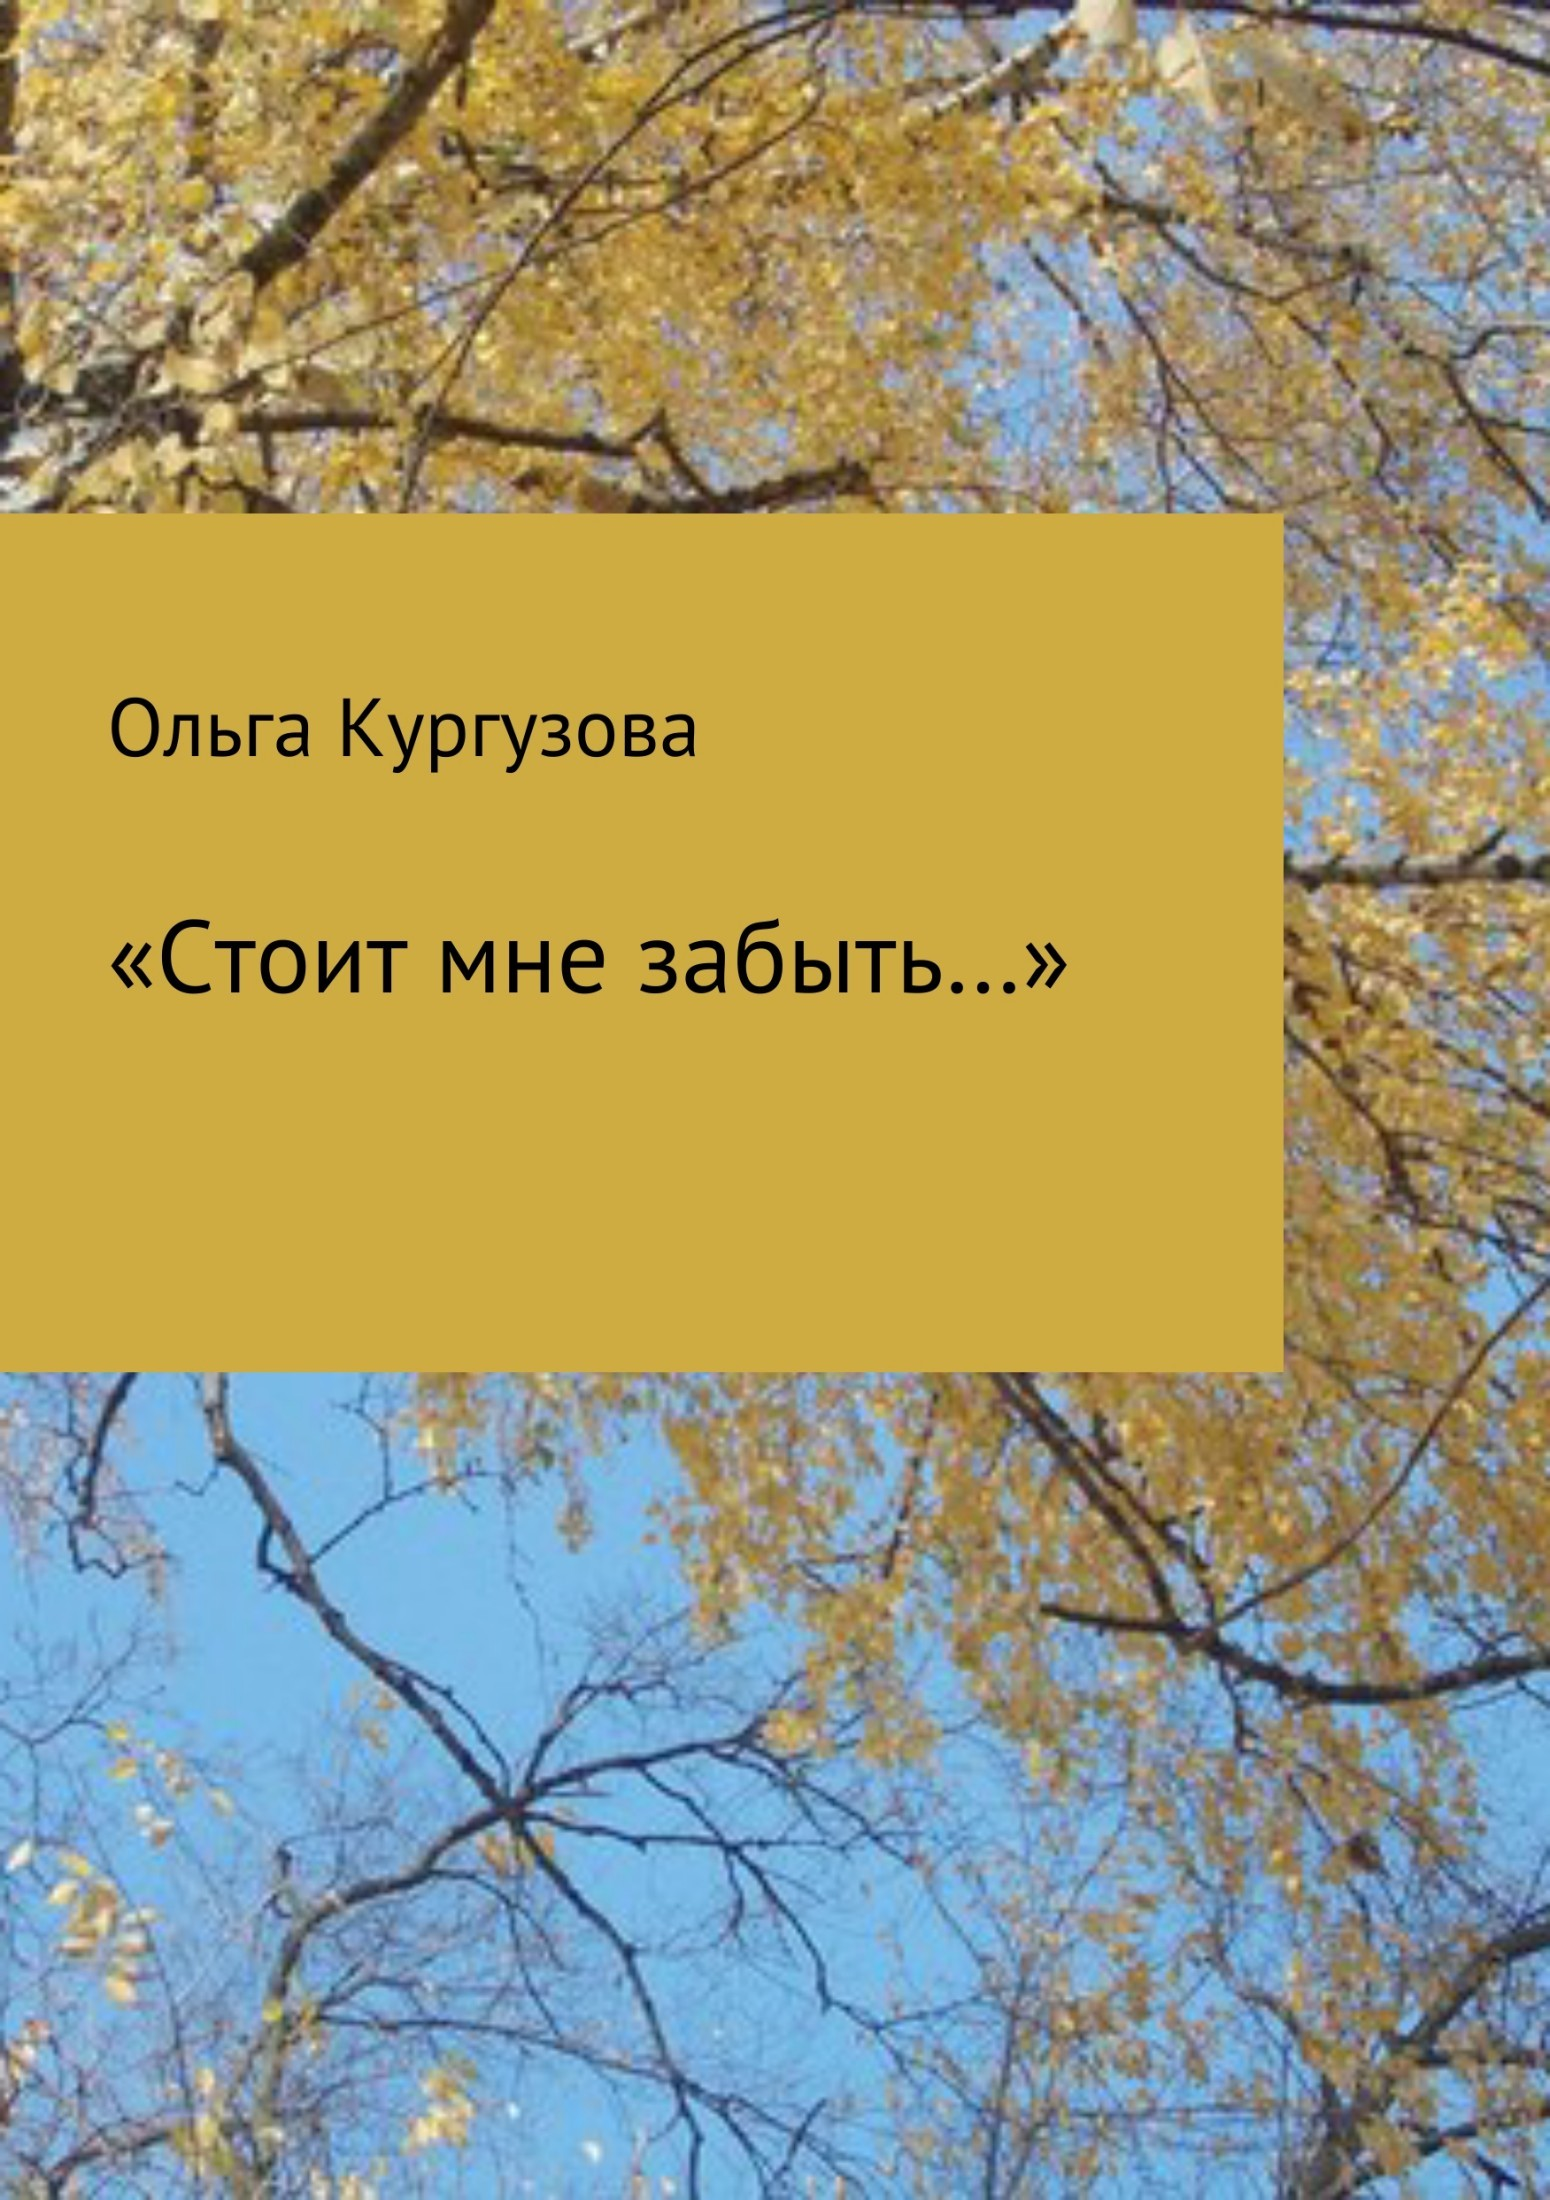 Ольга Ивановна Кулакевич ( Кургузова) «Стоит мне забыть…» маховская ольга ивановна